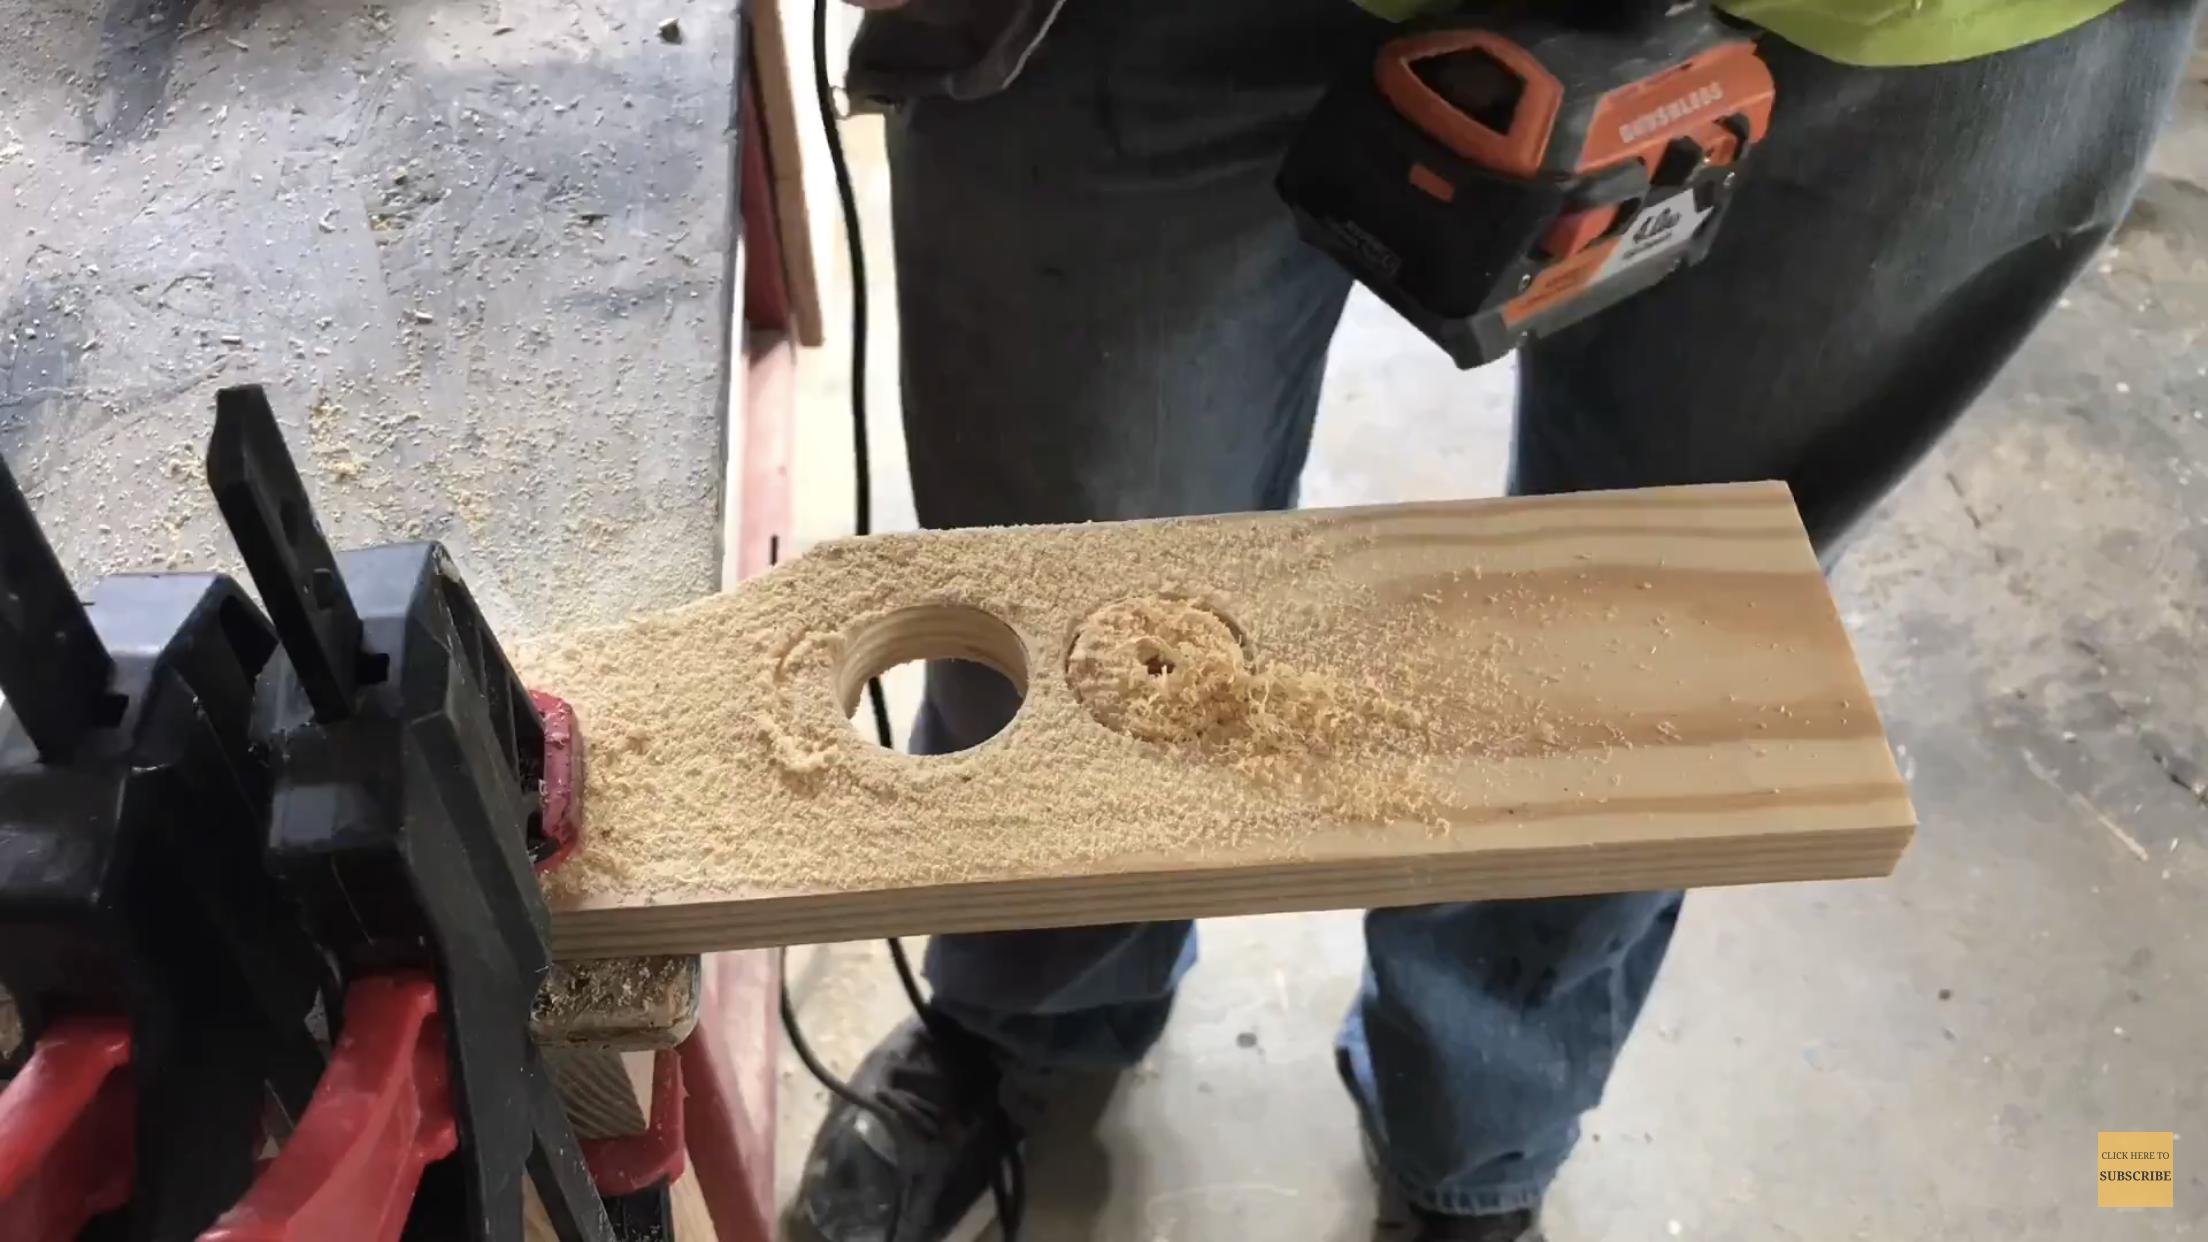 Using a hole saw to make handles